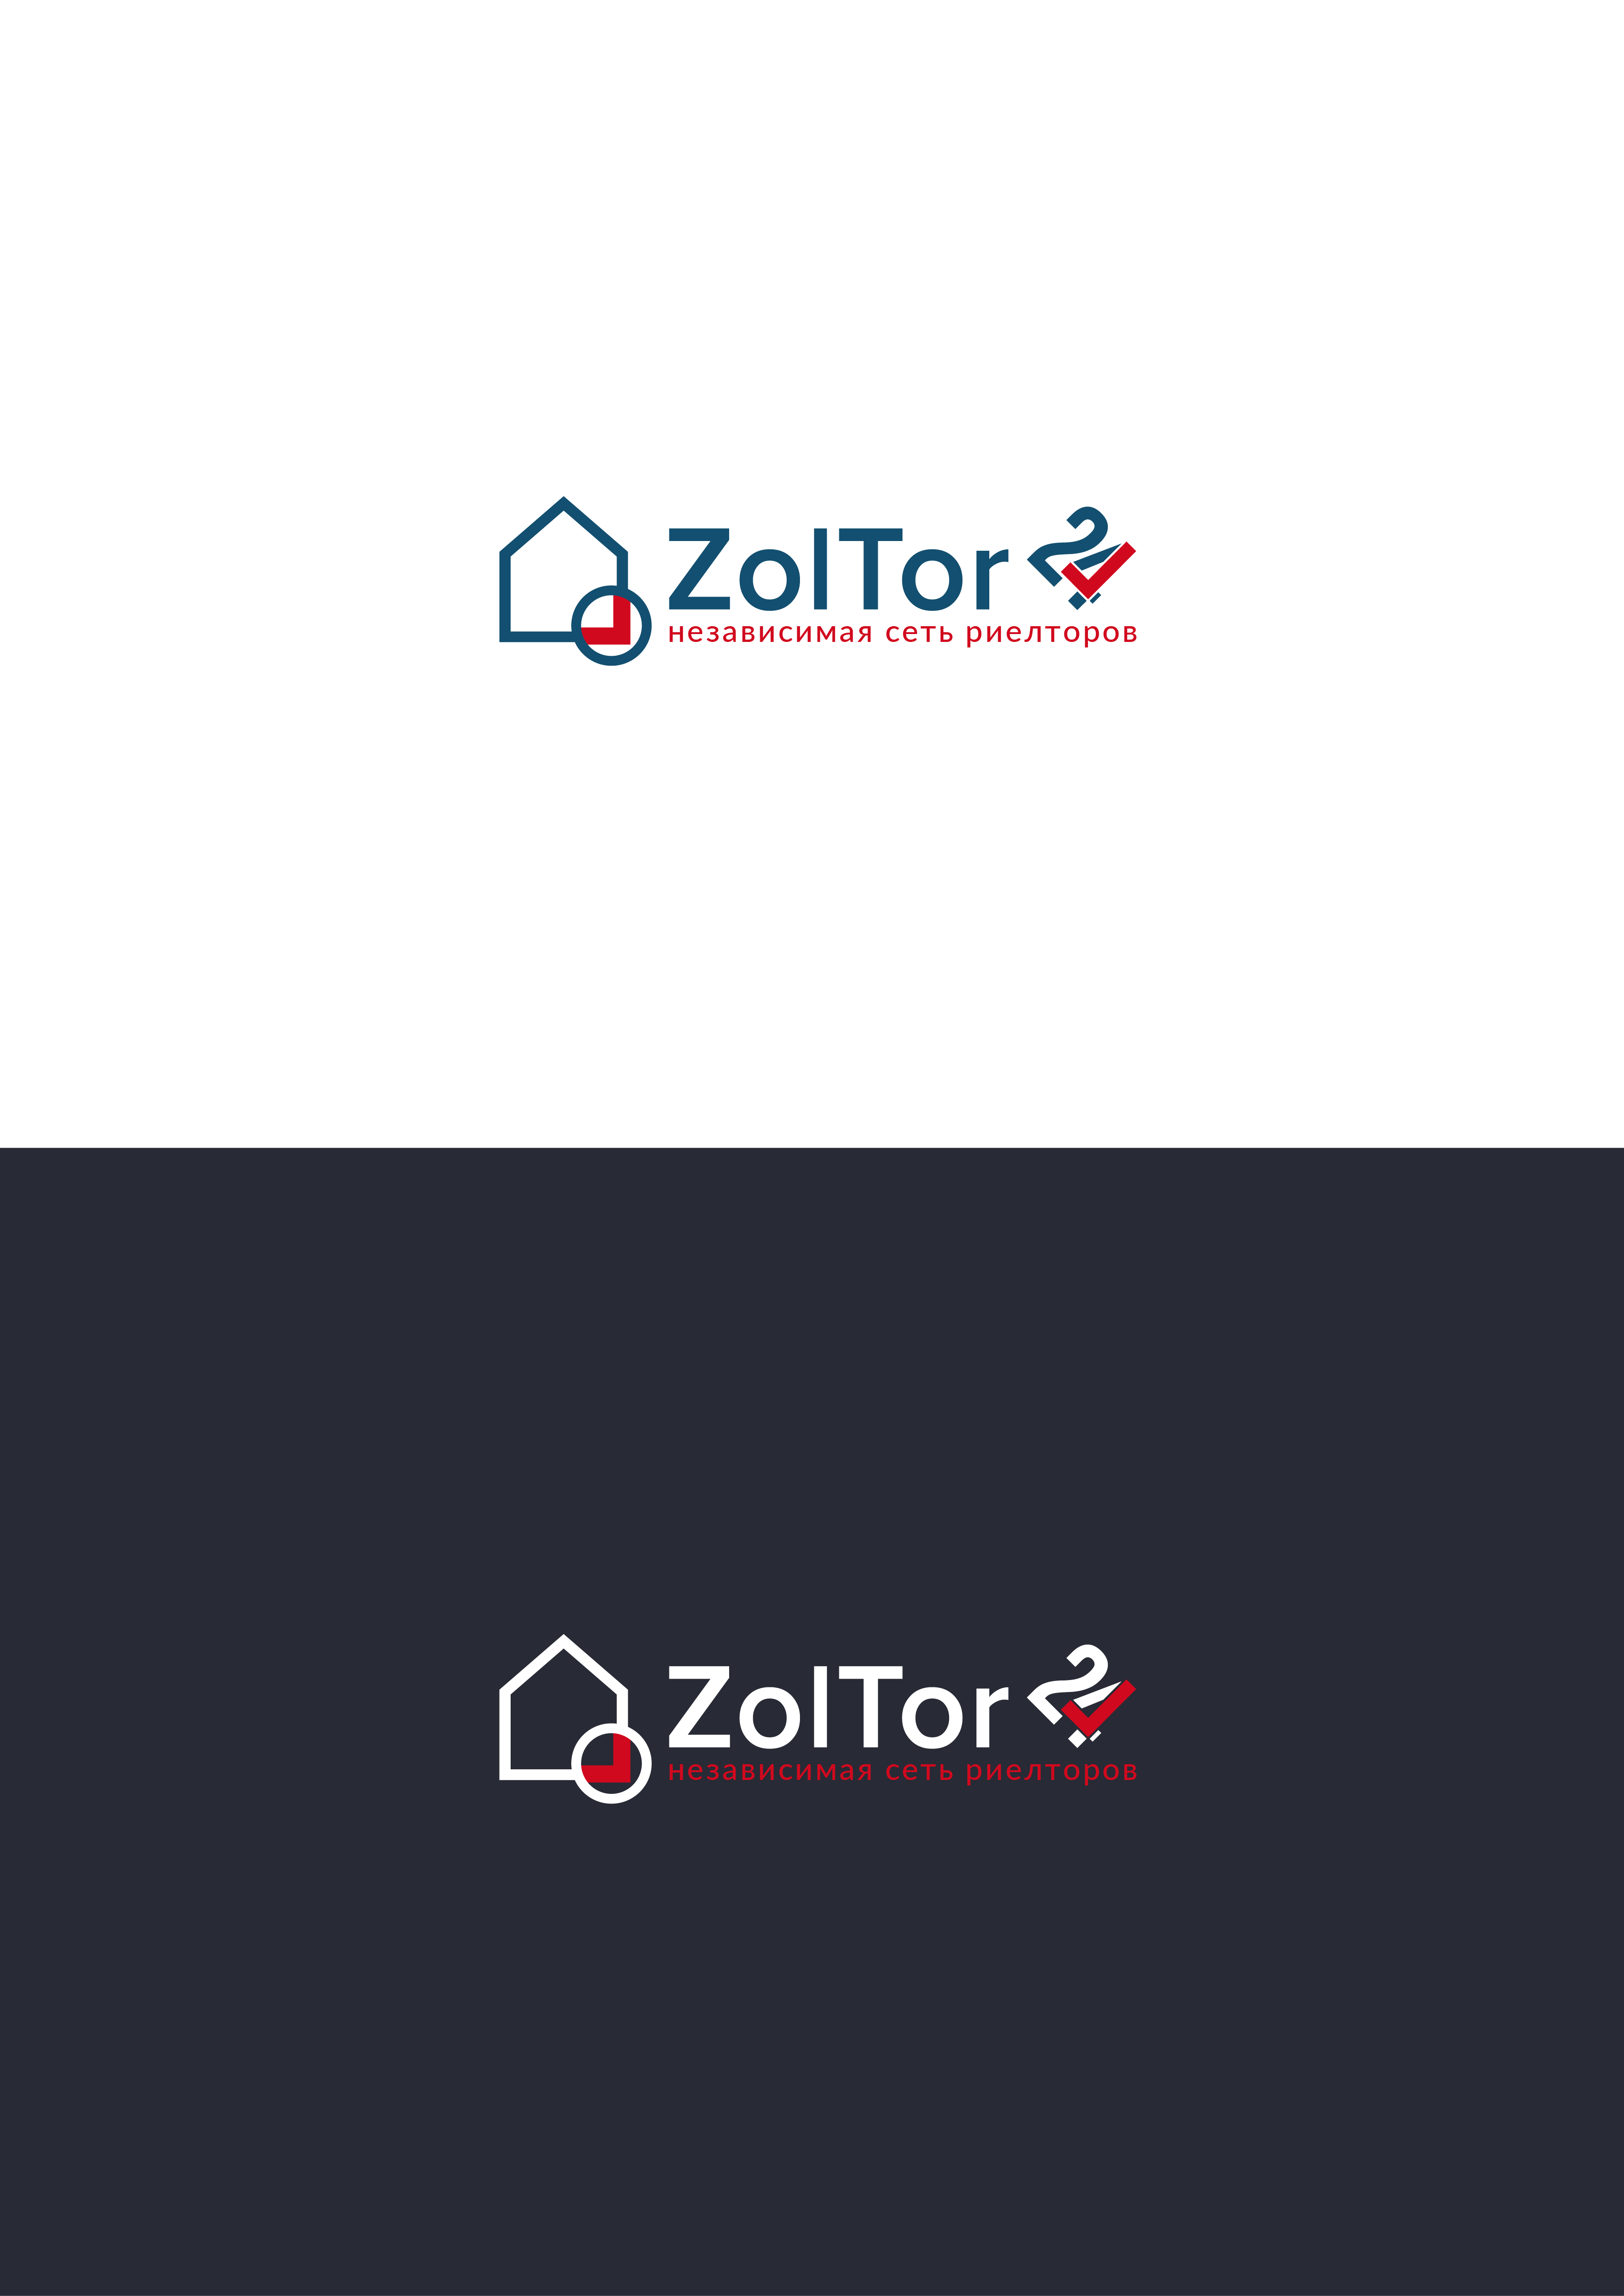 Логотип и фирменный стиль ZolTor24 фото f_6465c915c6b1b6fb.png